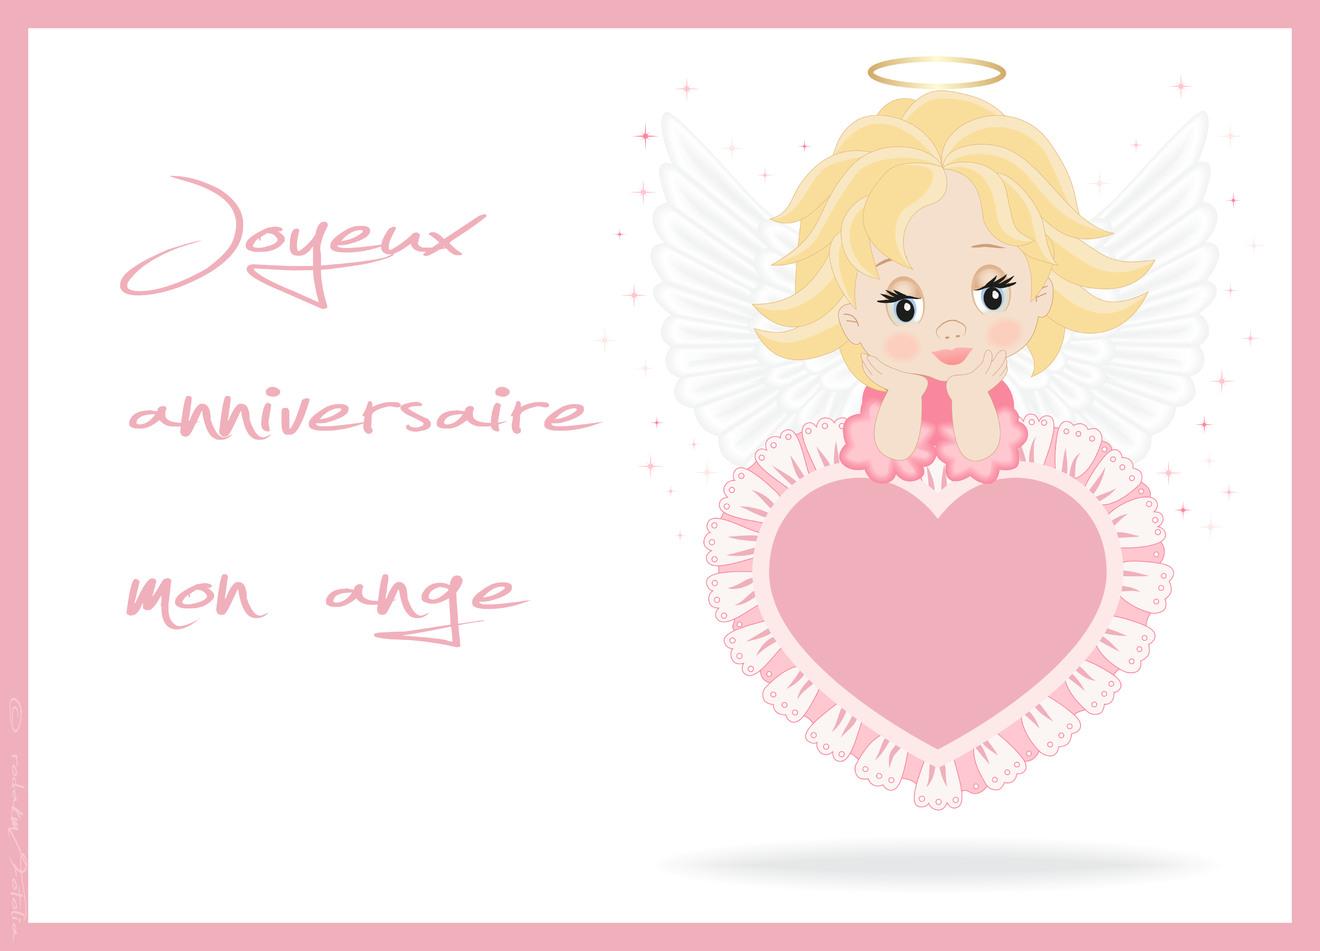 Joyeux anniversaire ange